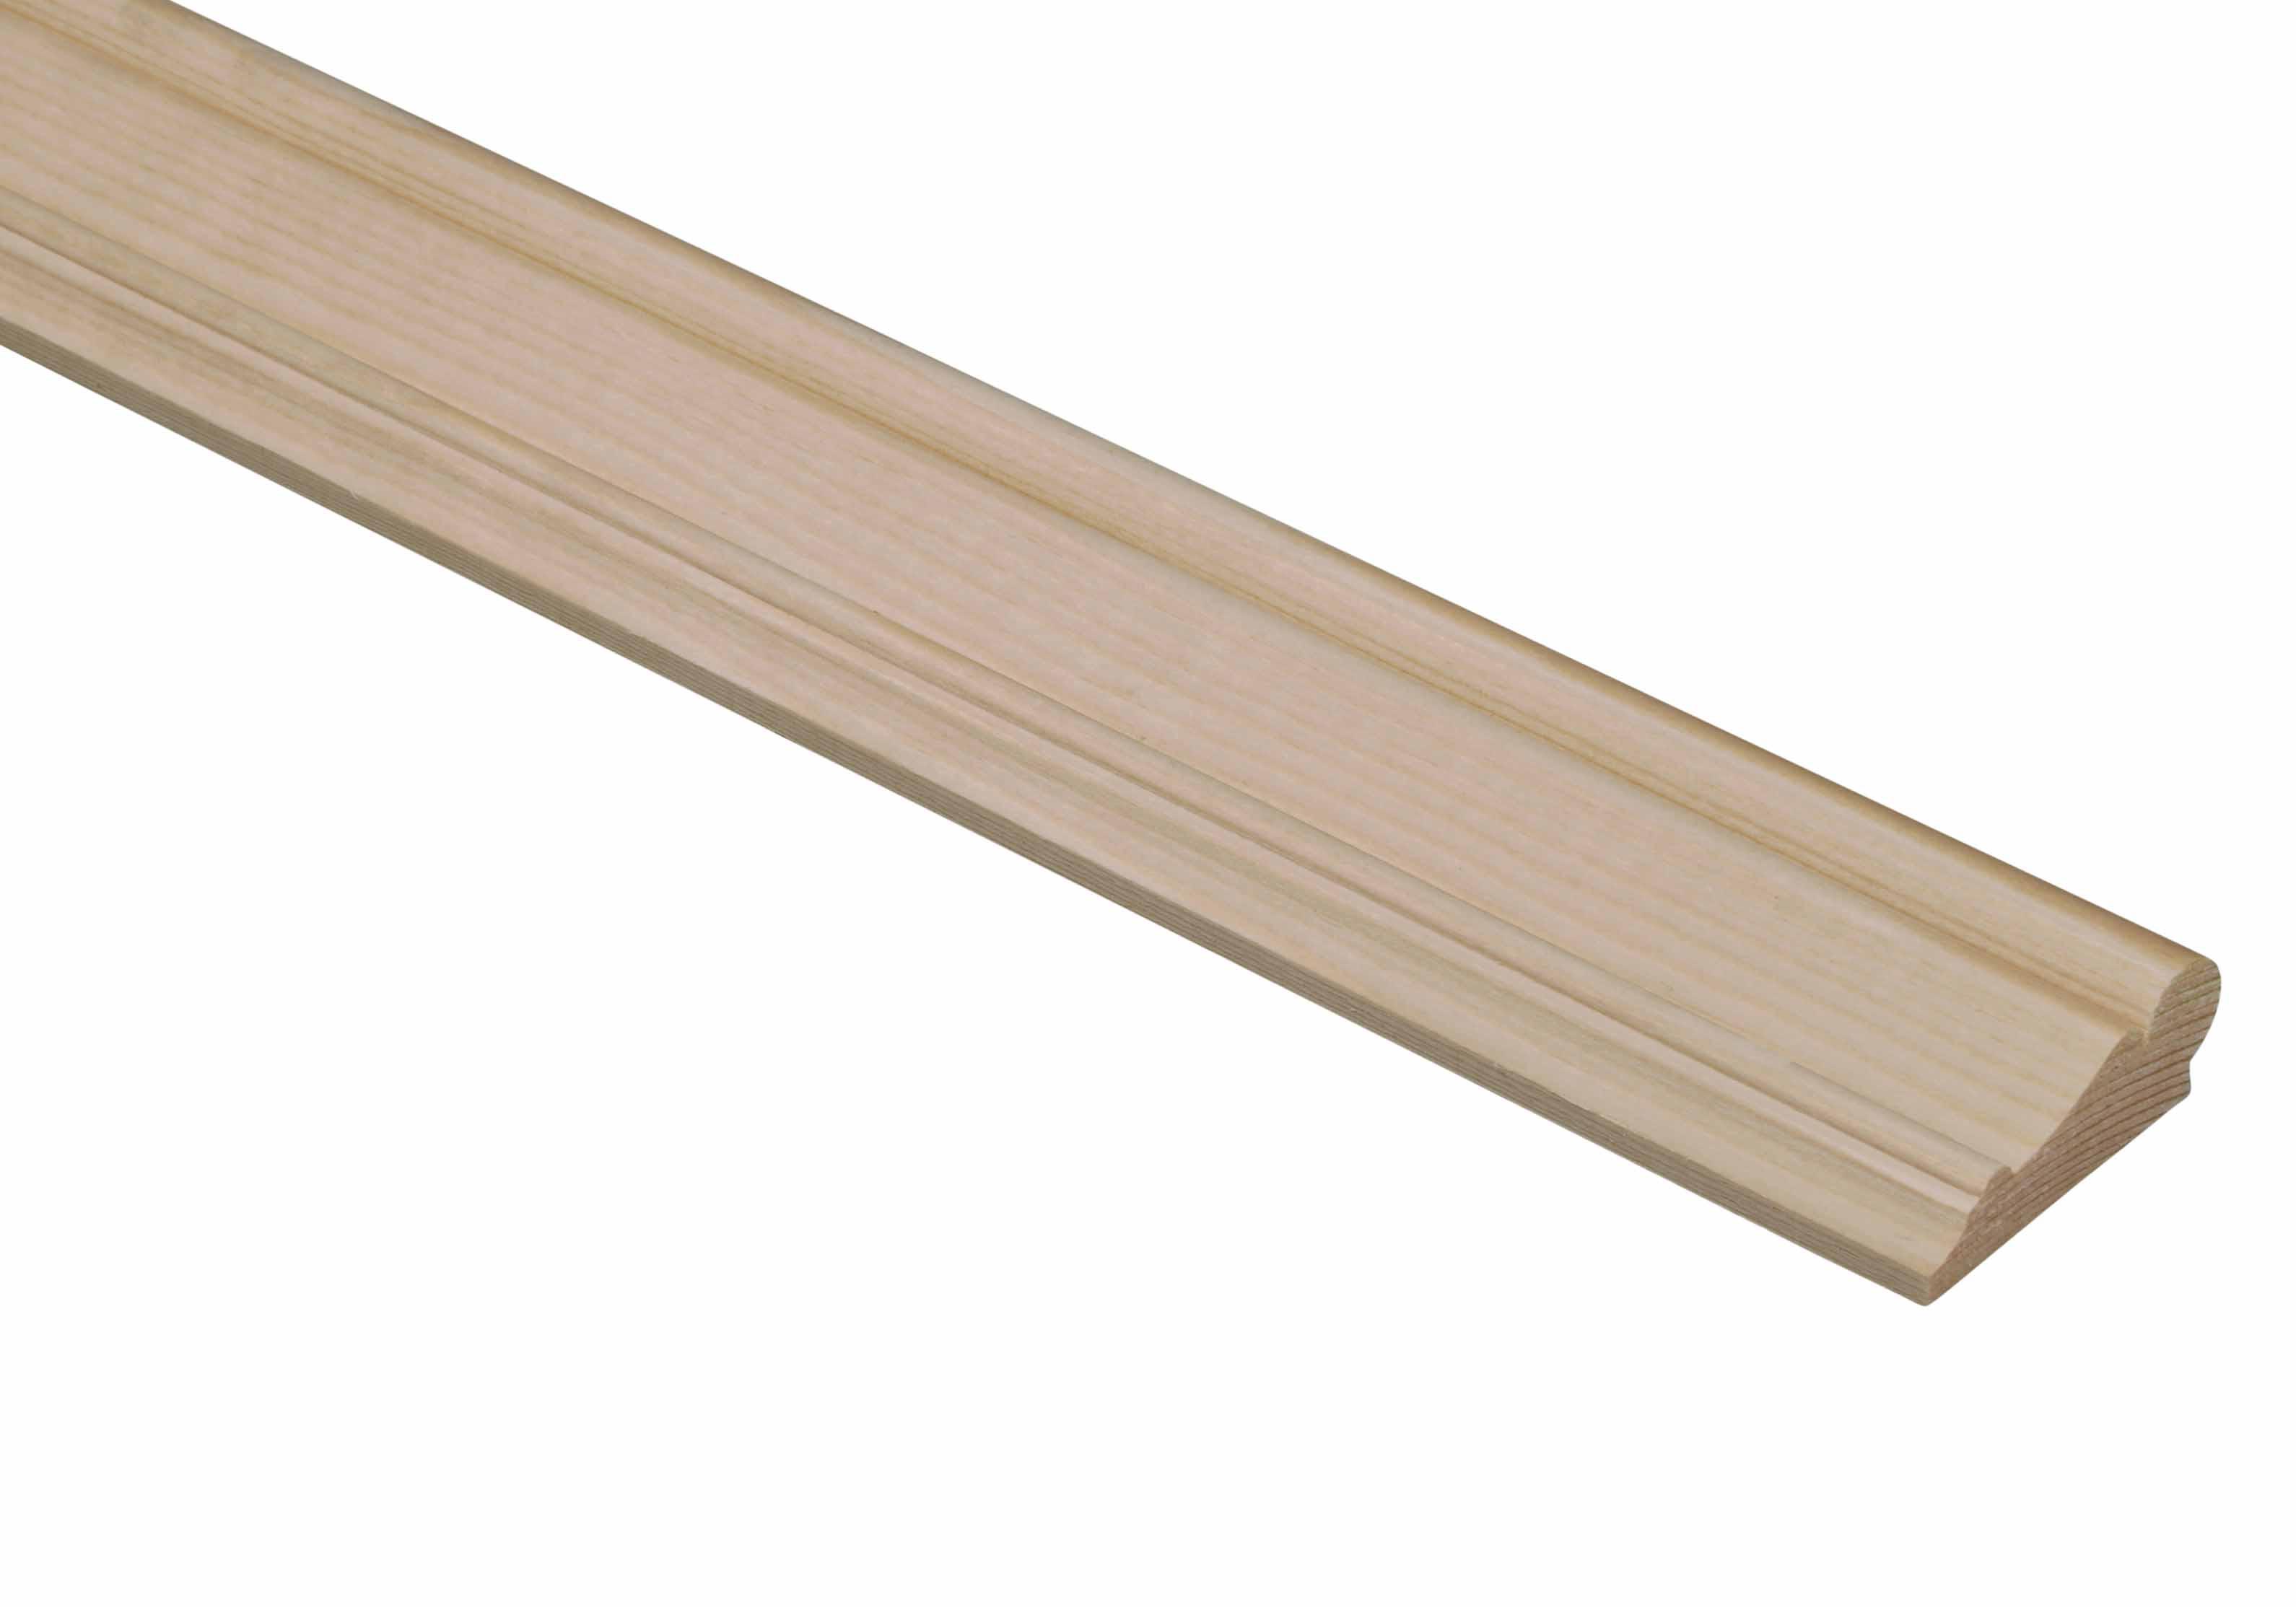 10 Pine Picture Rail Mouldings 15 x 42 x 2400mm